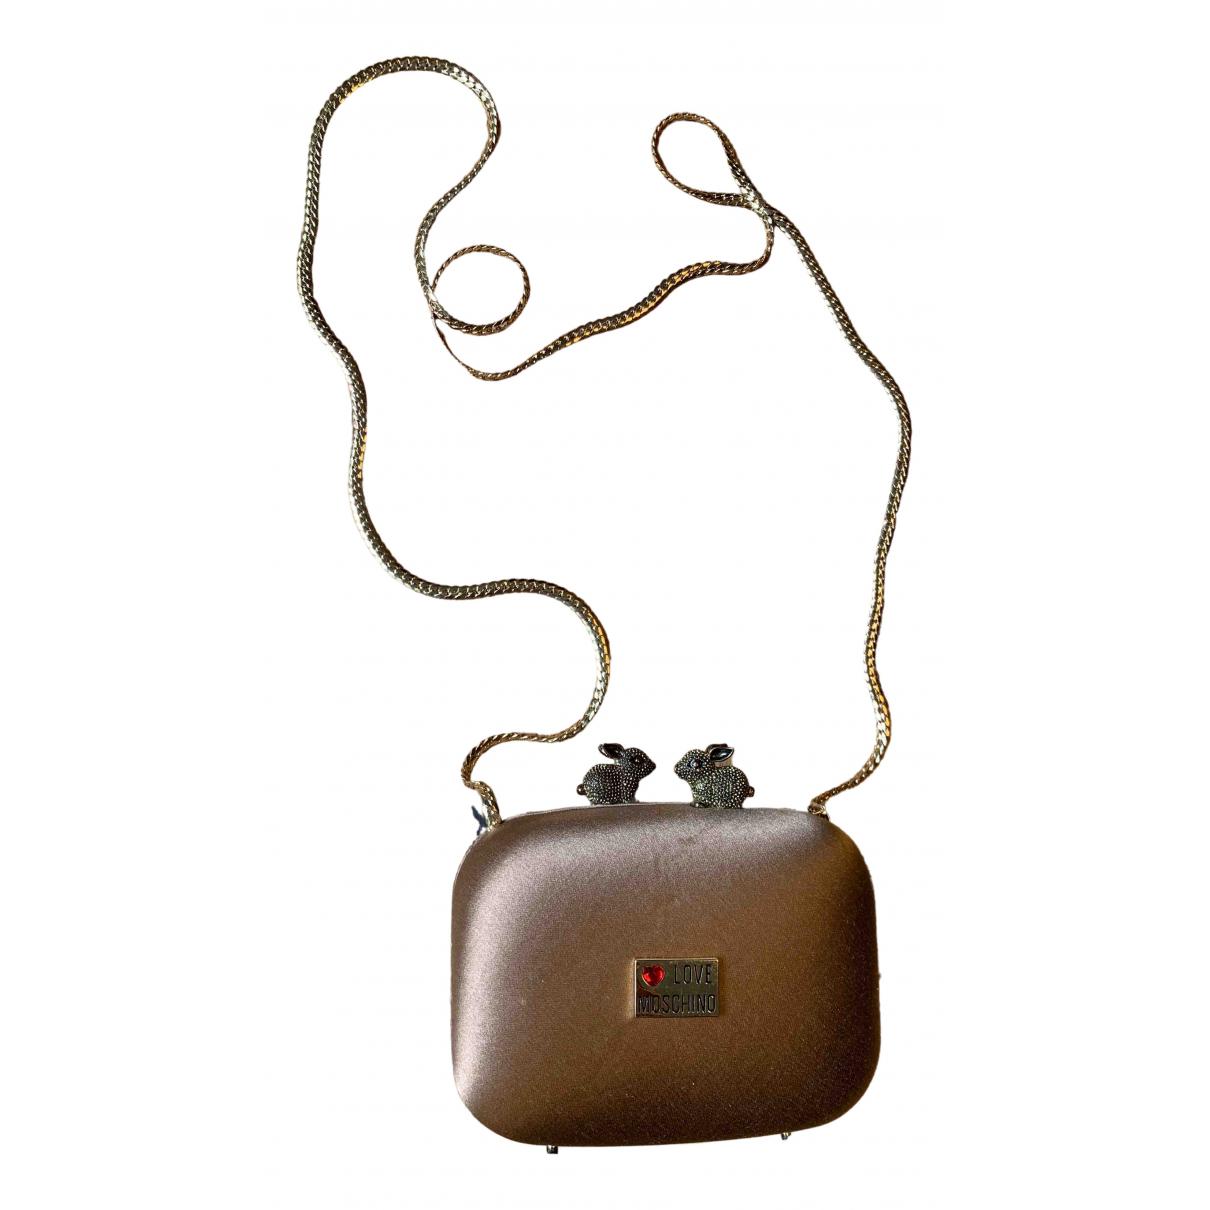 Moschino Love N Beige handbag for Women N